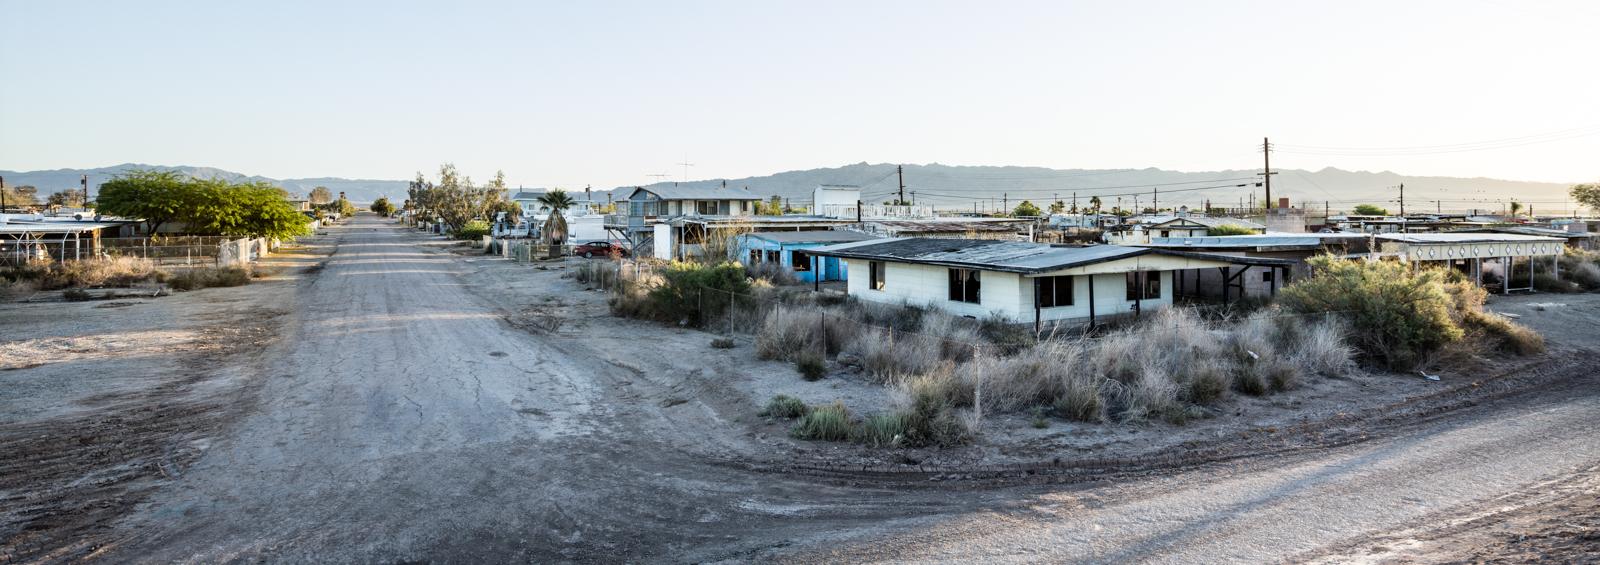 Bombay Beach neighborhood in the Salton Sea.